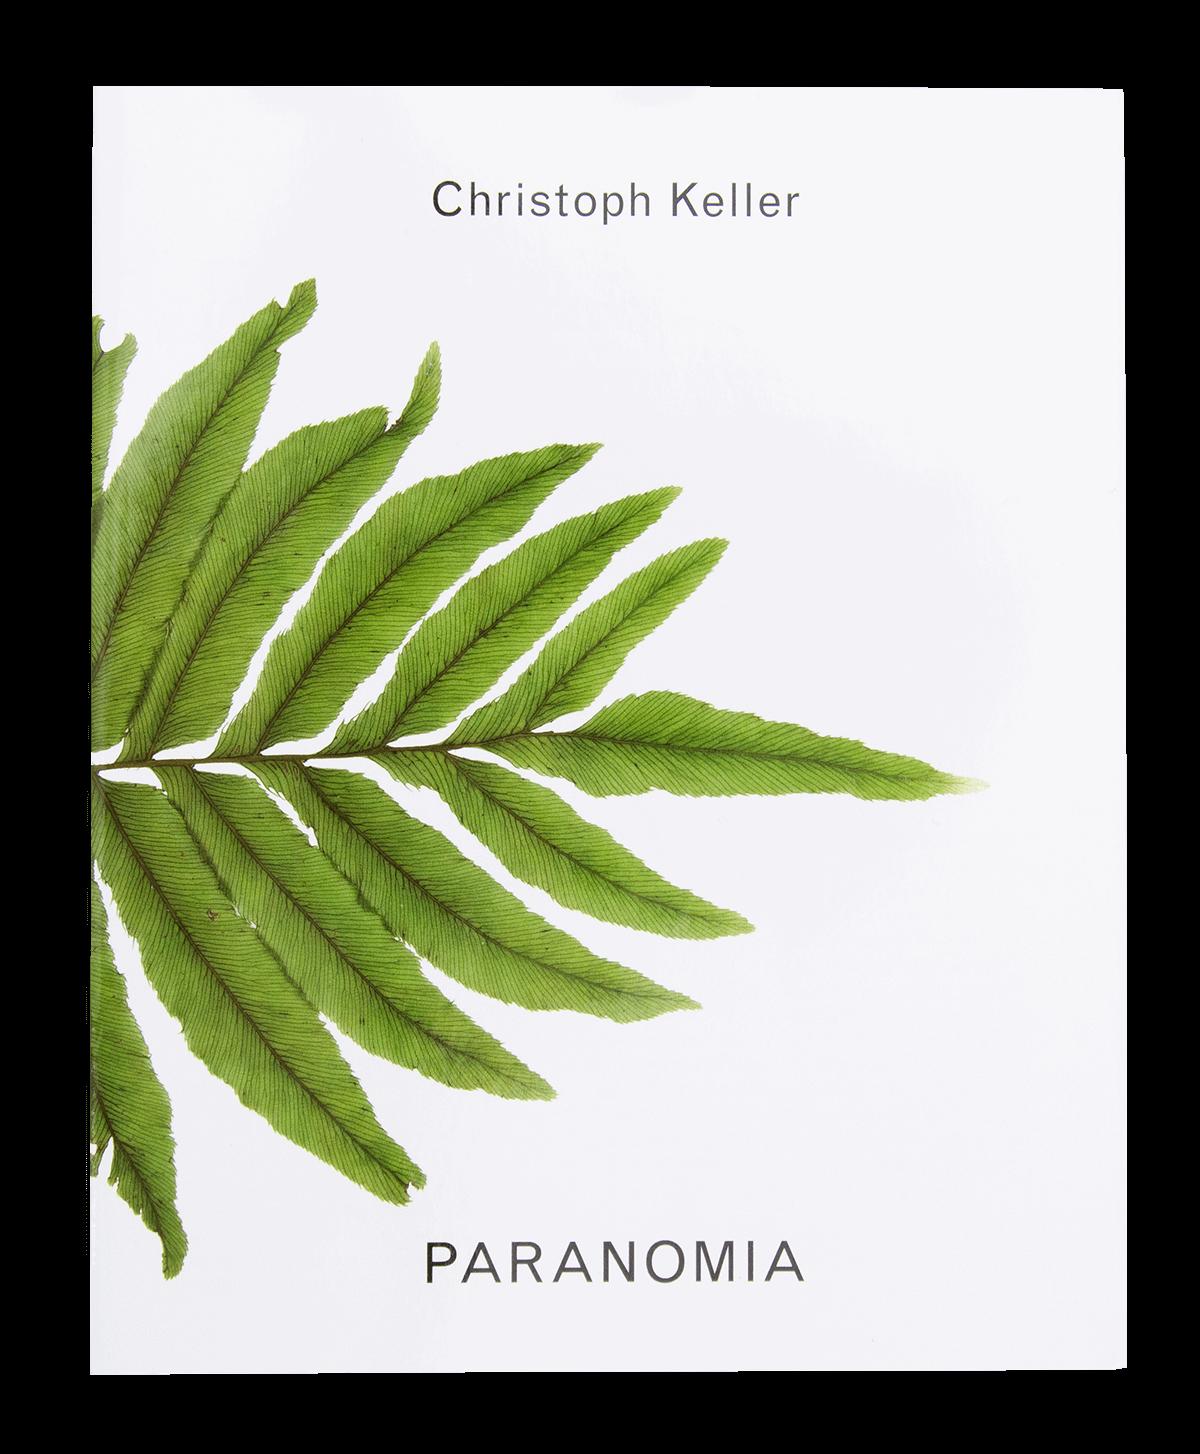 Christoph-Keller-Paranomia-cover-1